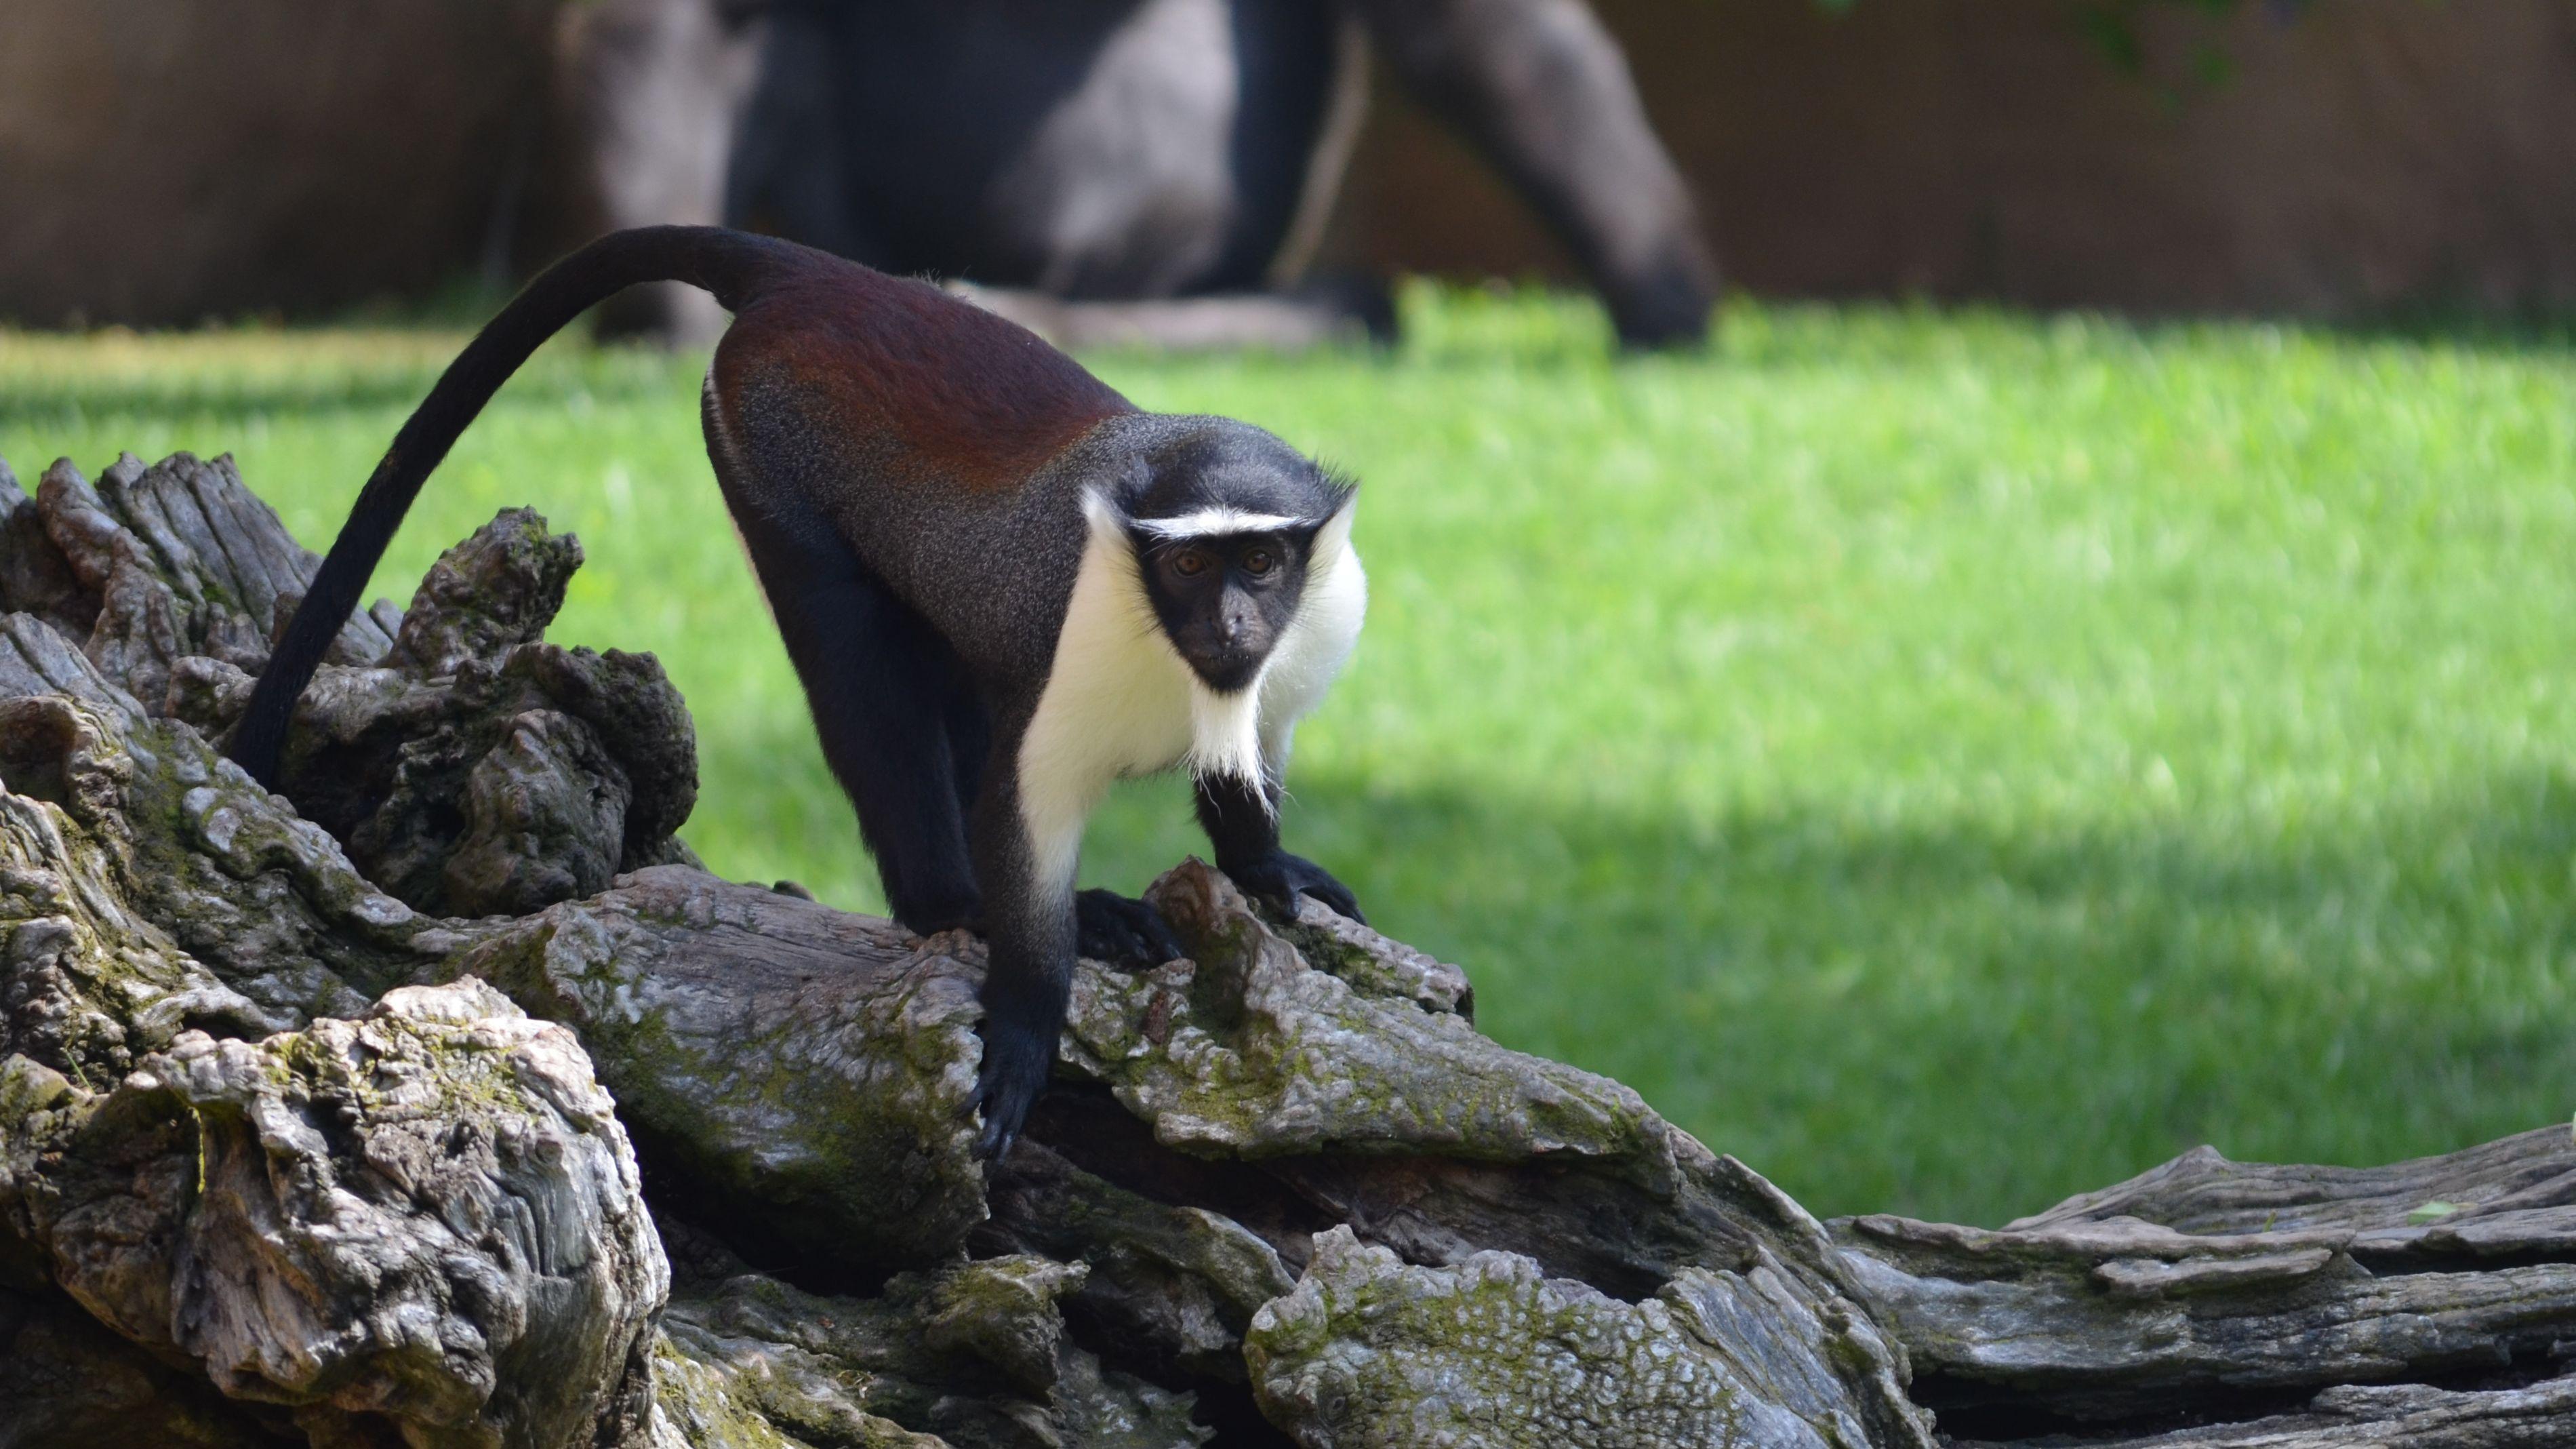 Small monkey in enclosure at Bioparc Fuengirola in Malaga